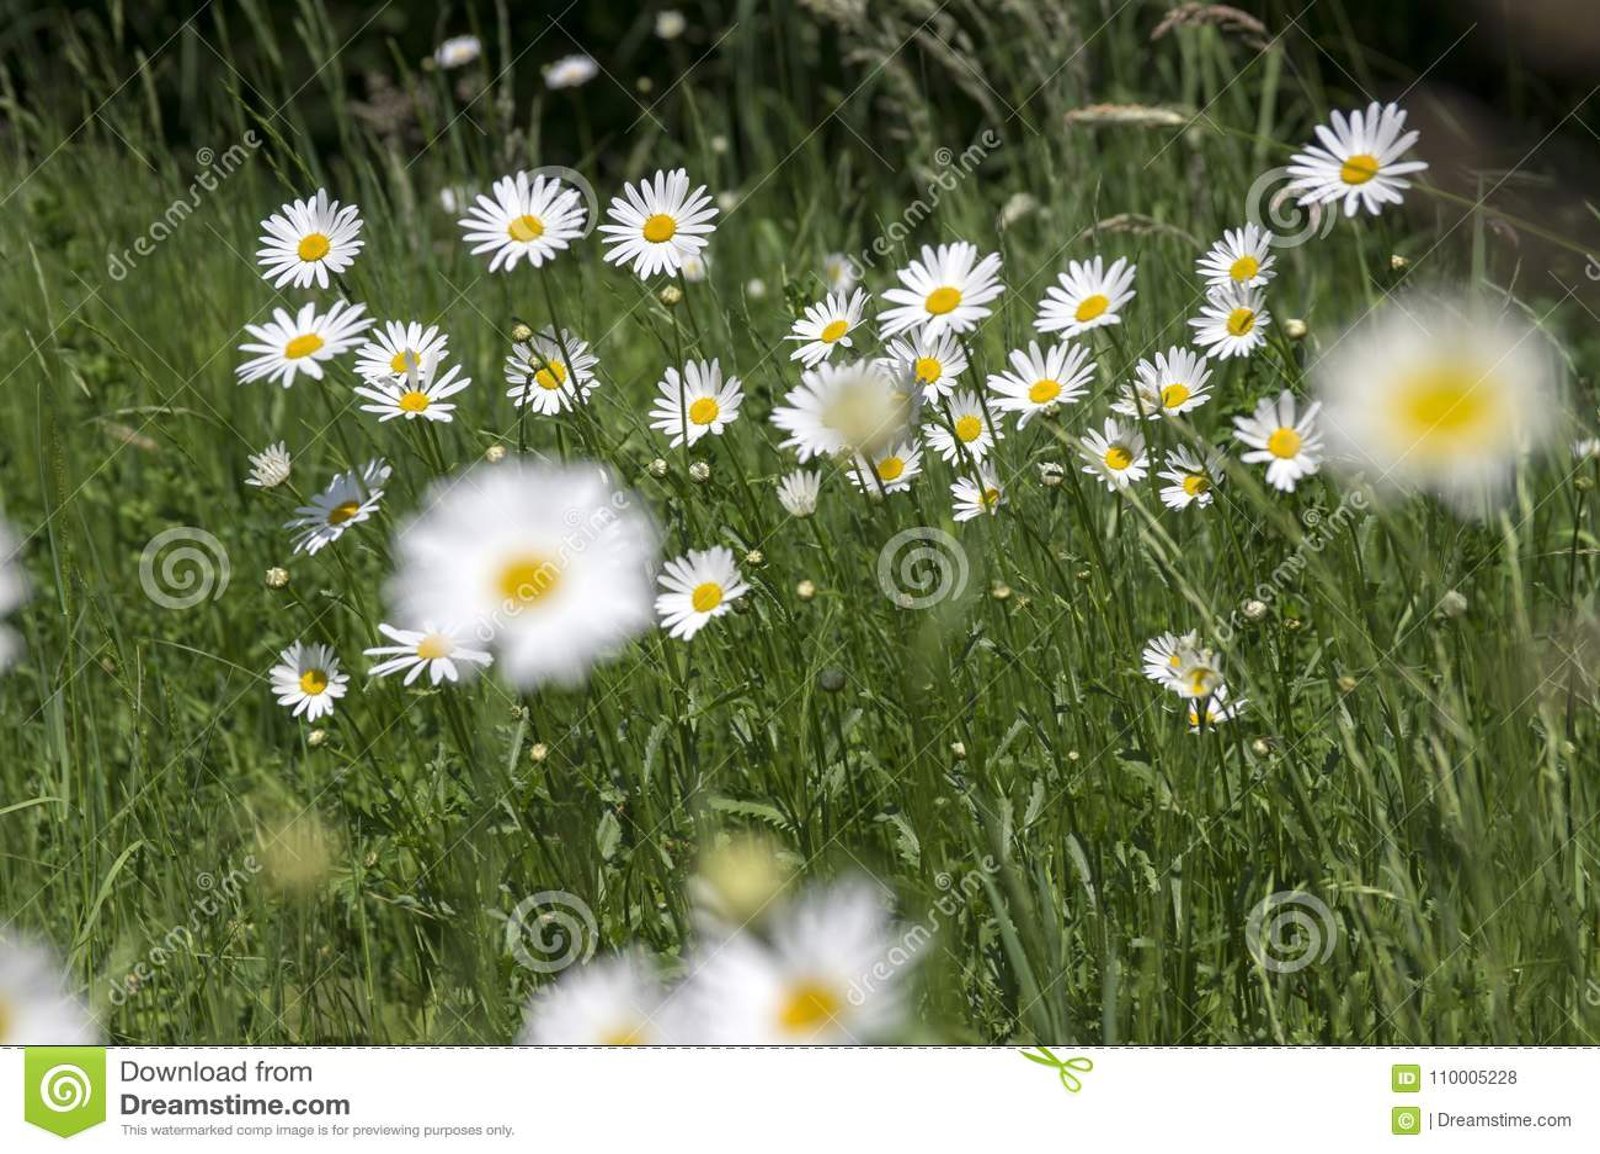 Leucanthemum vulgare meadows wild flower with white petals and leucanthemum vulgare meadows wild flower with white petals and yellow center in bloom mightylinksfo